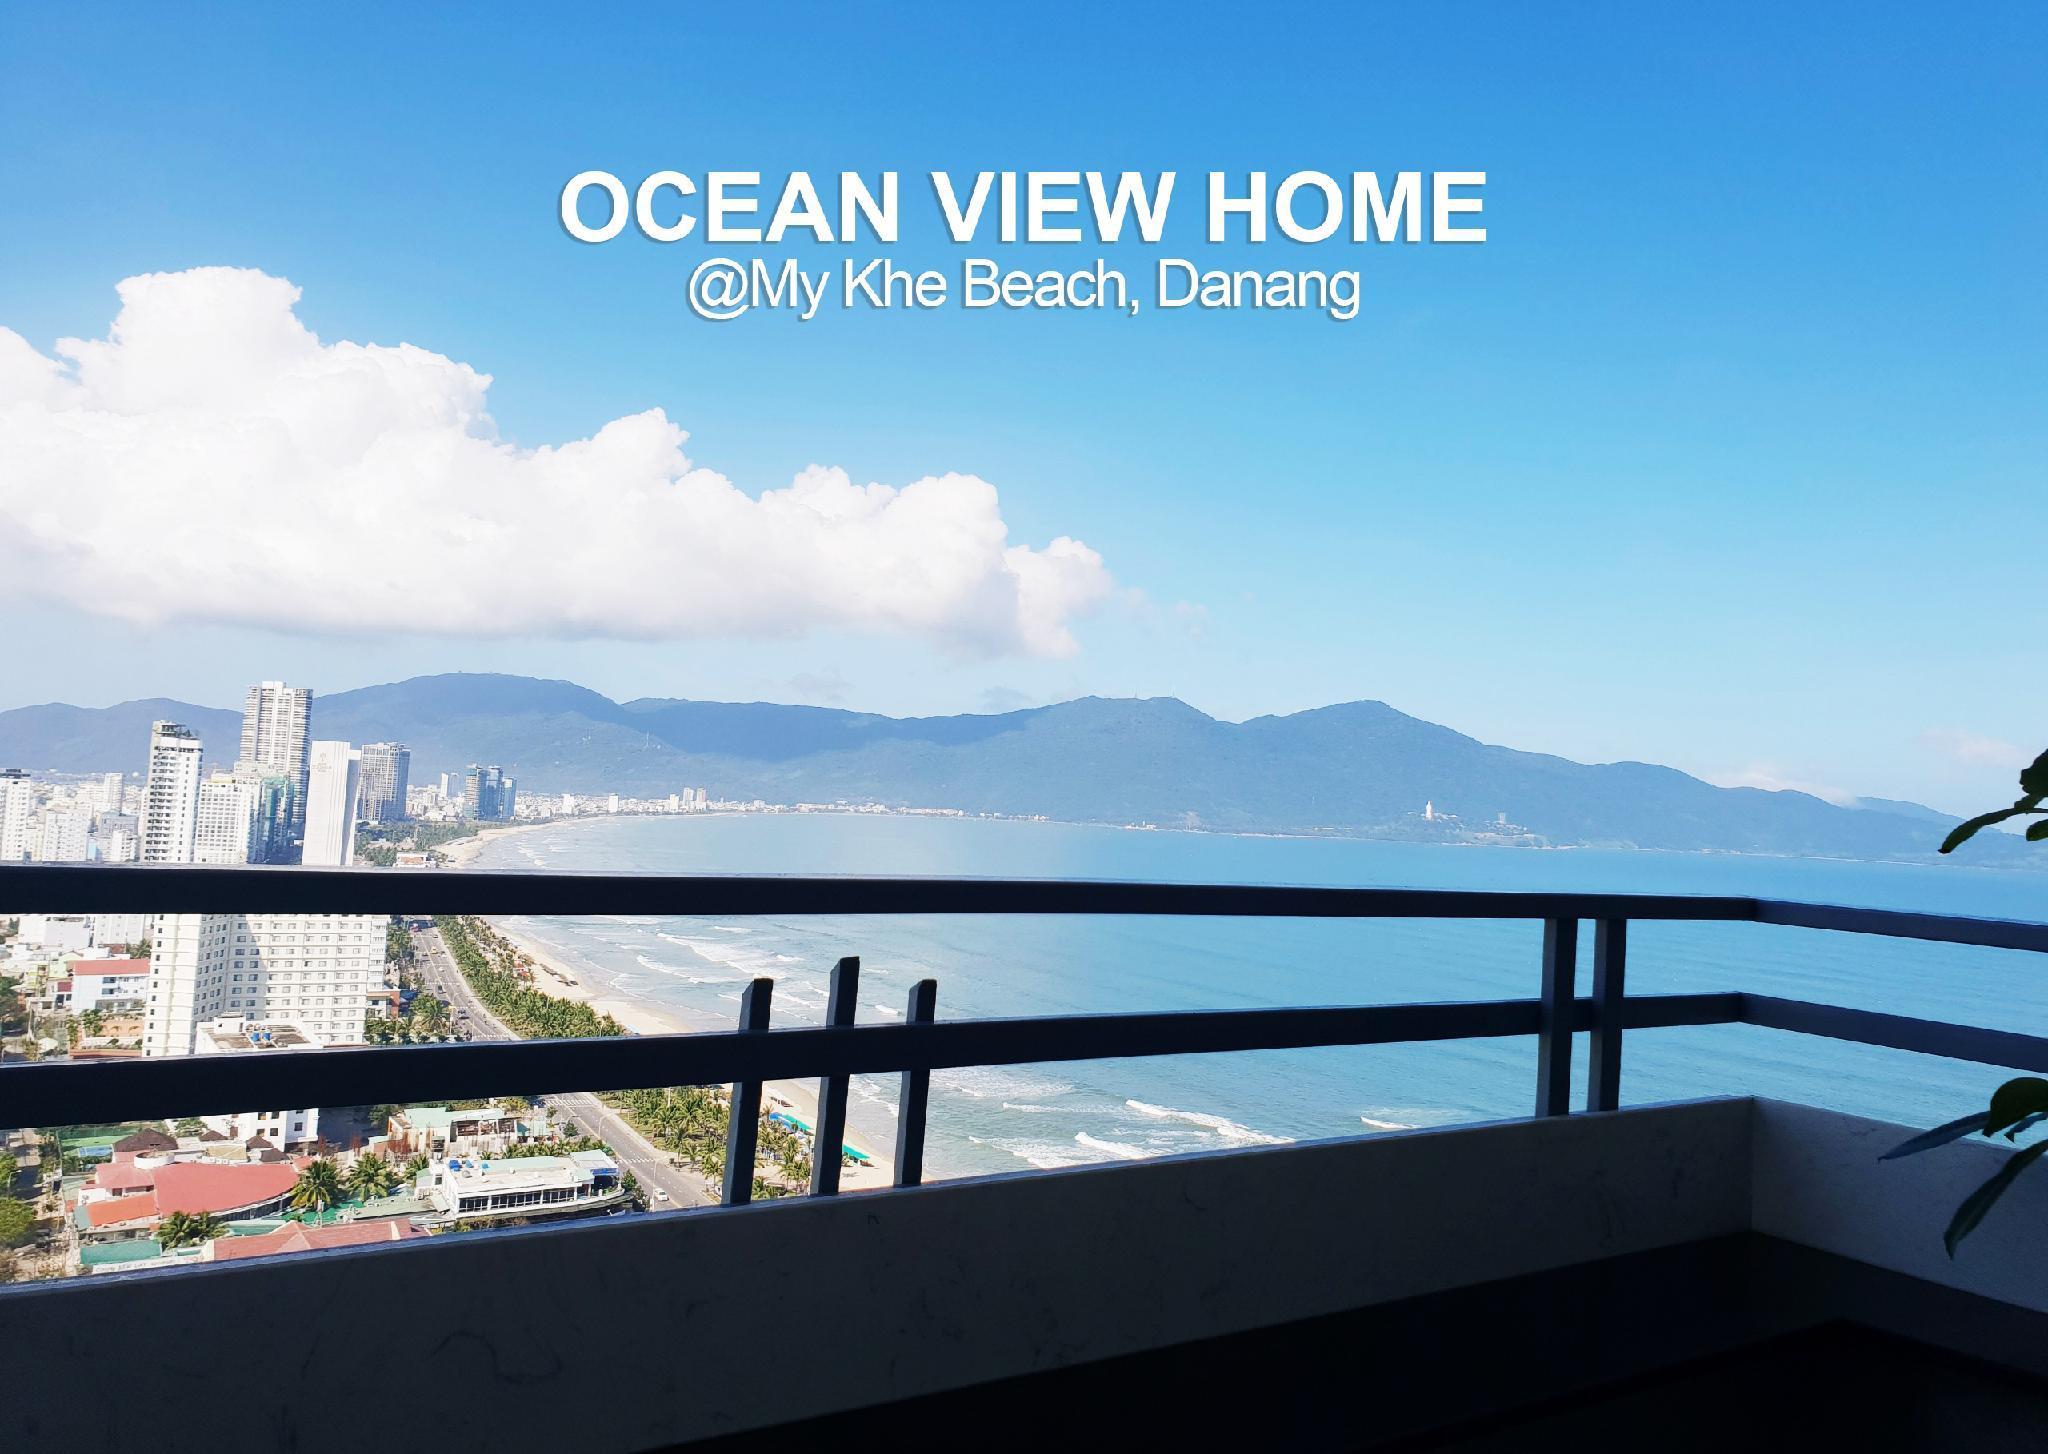 WOW HOME WITH OCEAN VIEW MY KHE BEACH